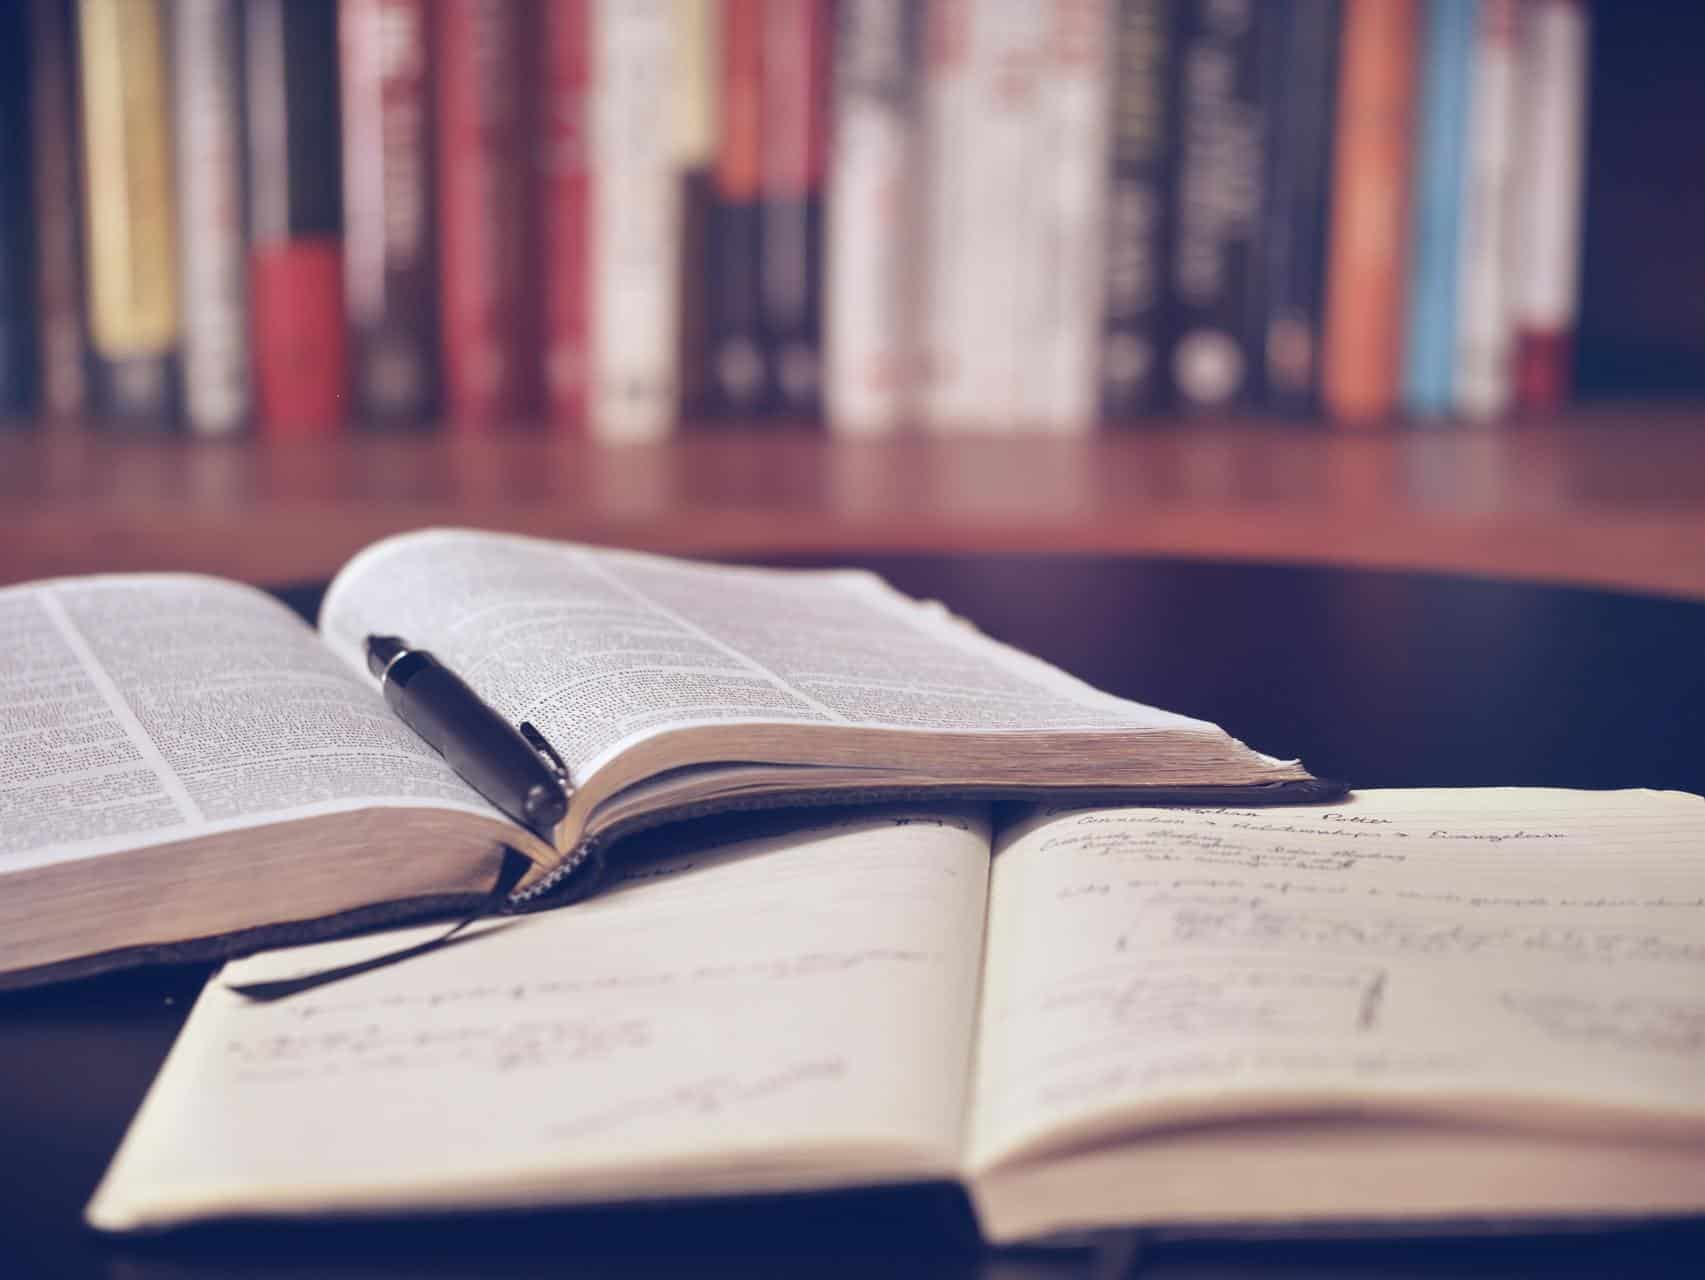 books bookshelf education 159621